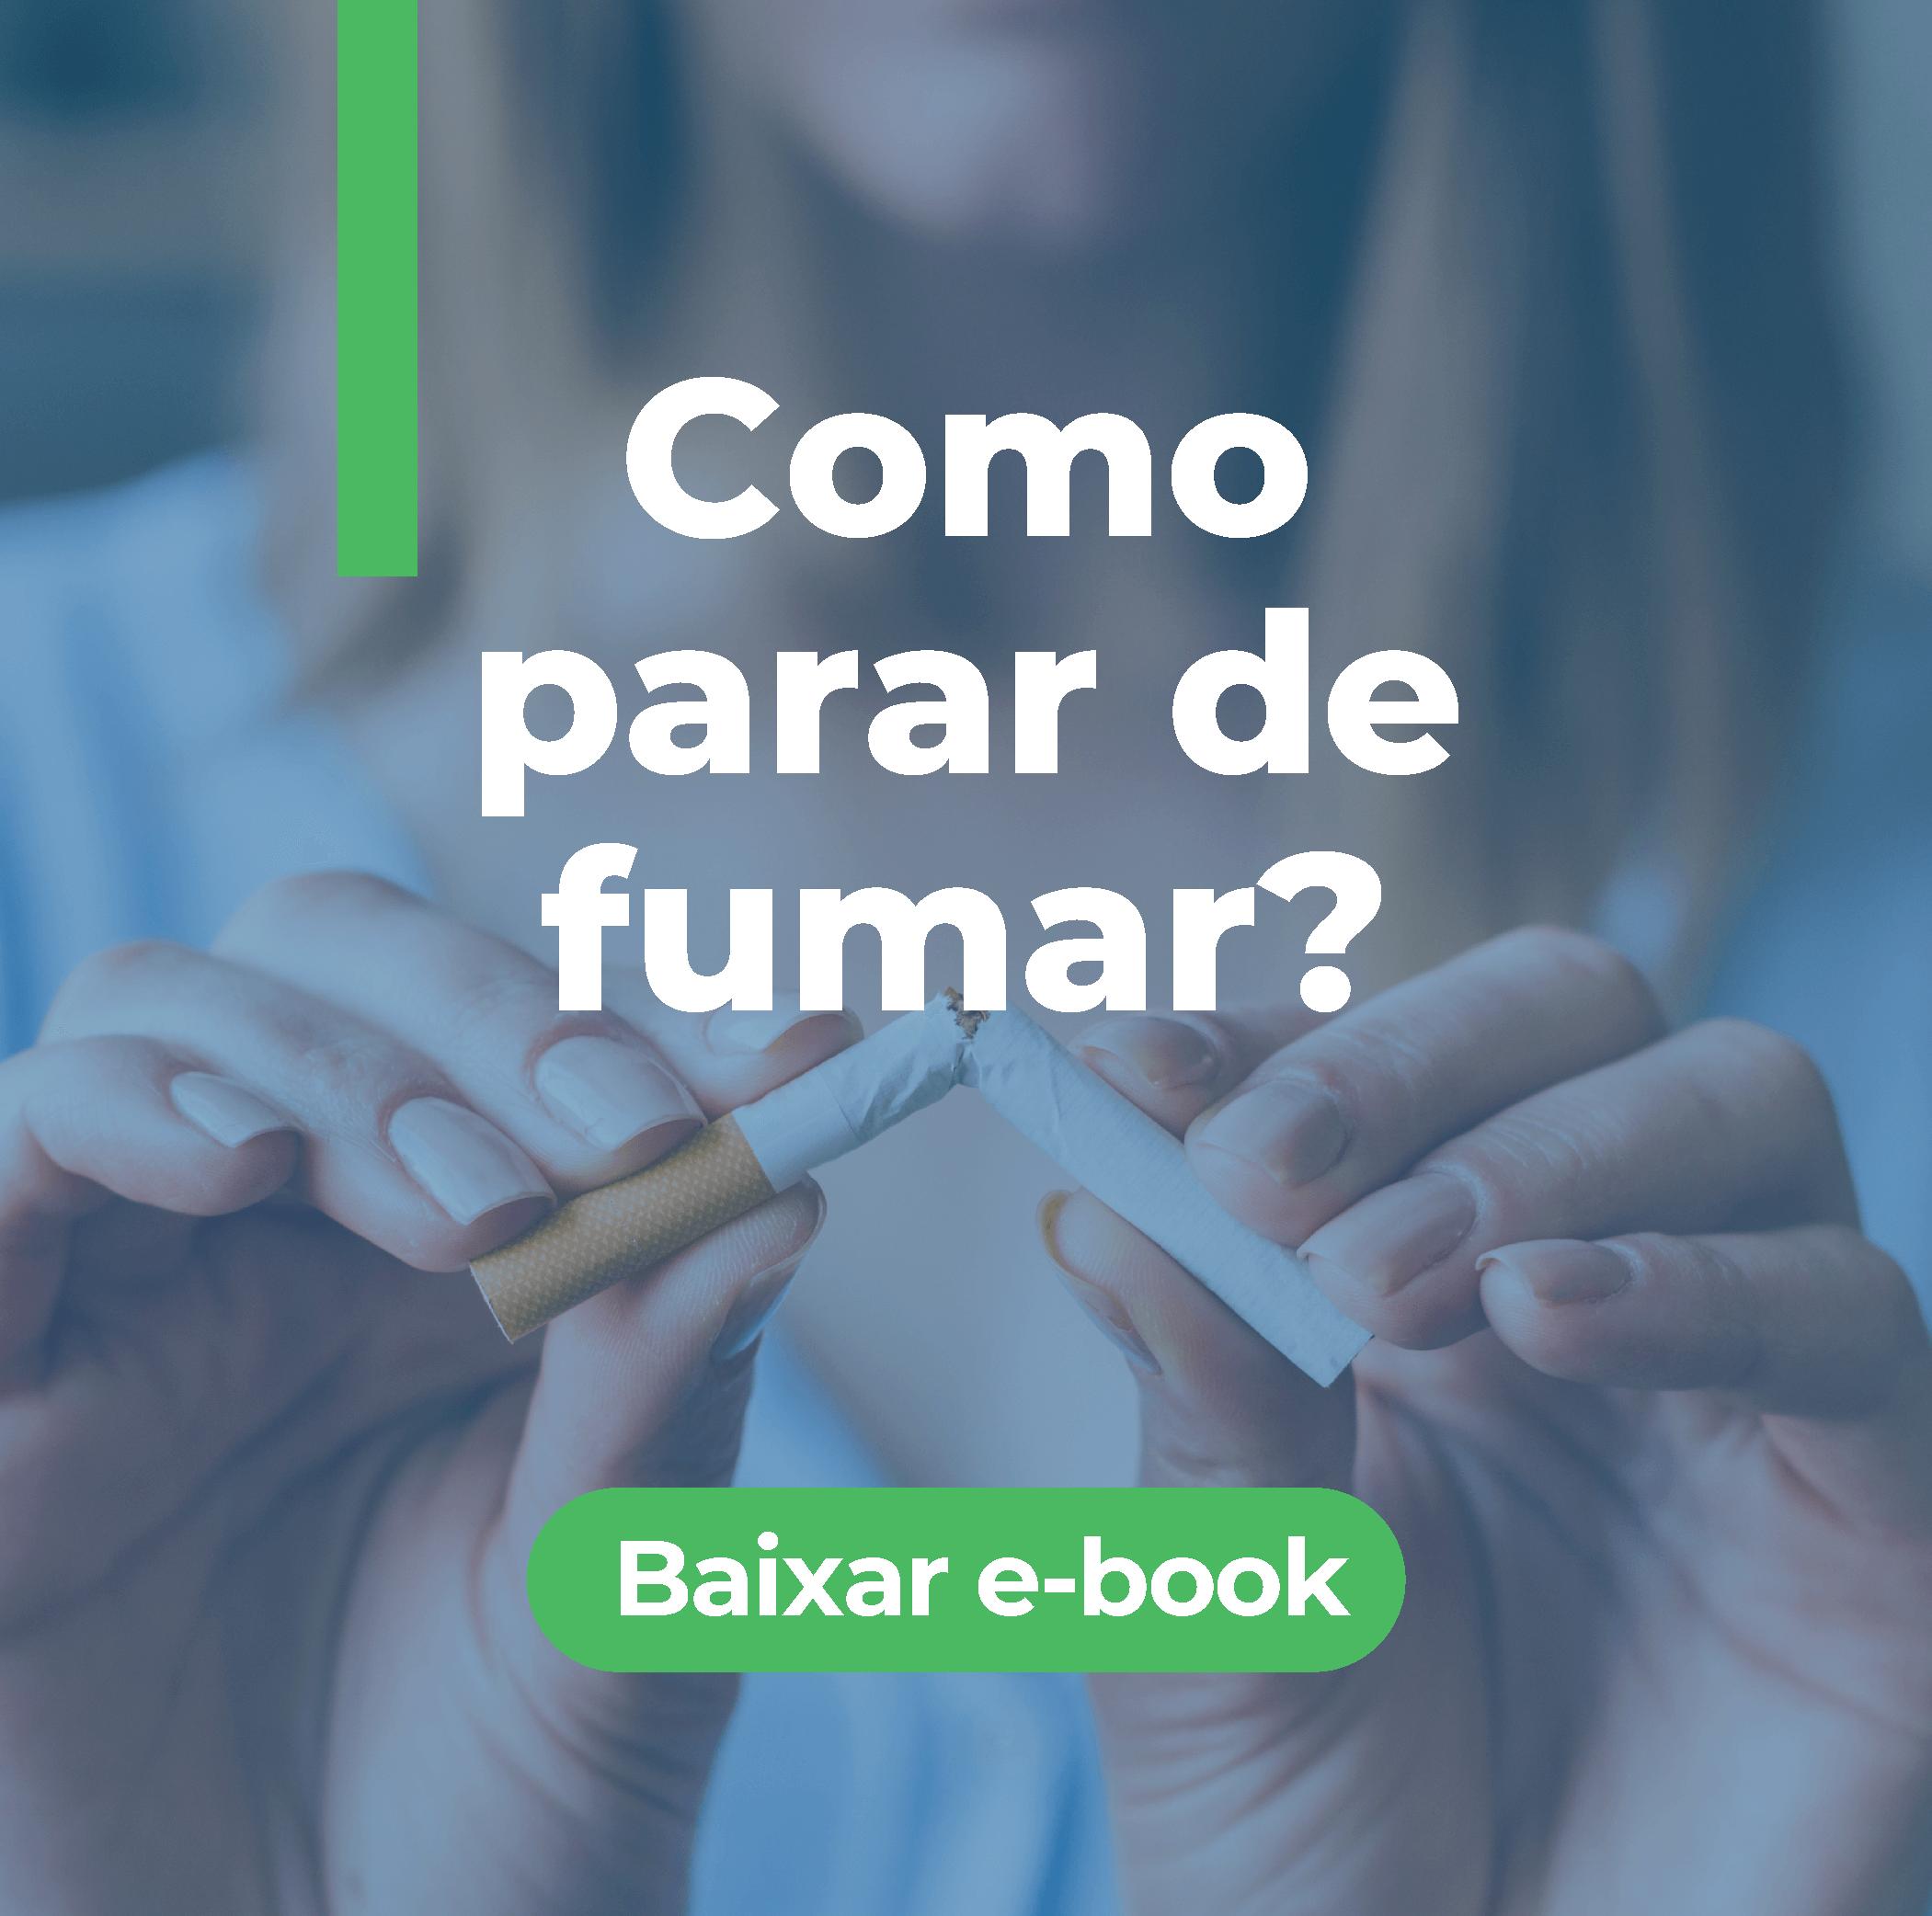 https://conteudo.nicap.com.br/ebook-como-parar-de-fumar